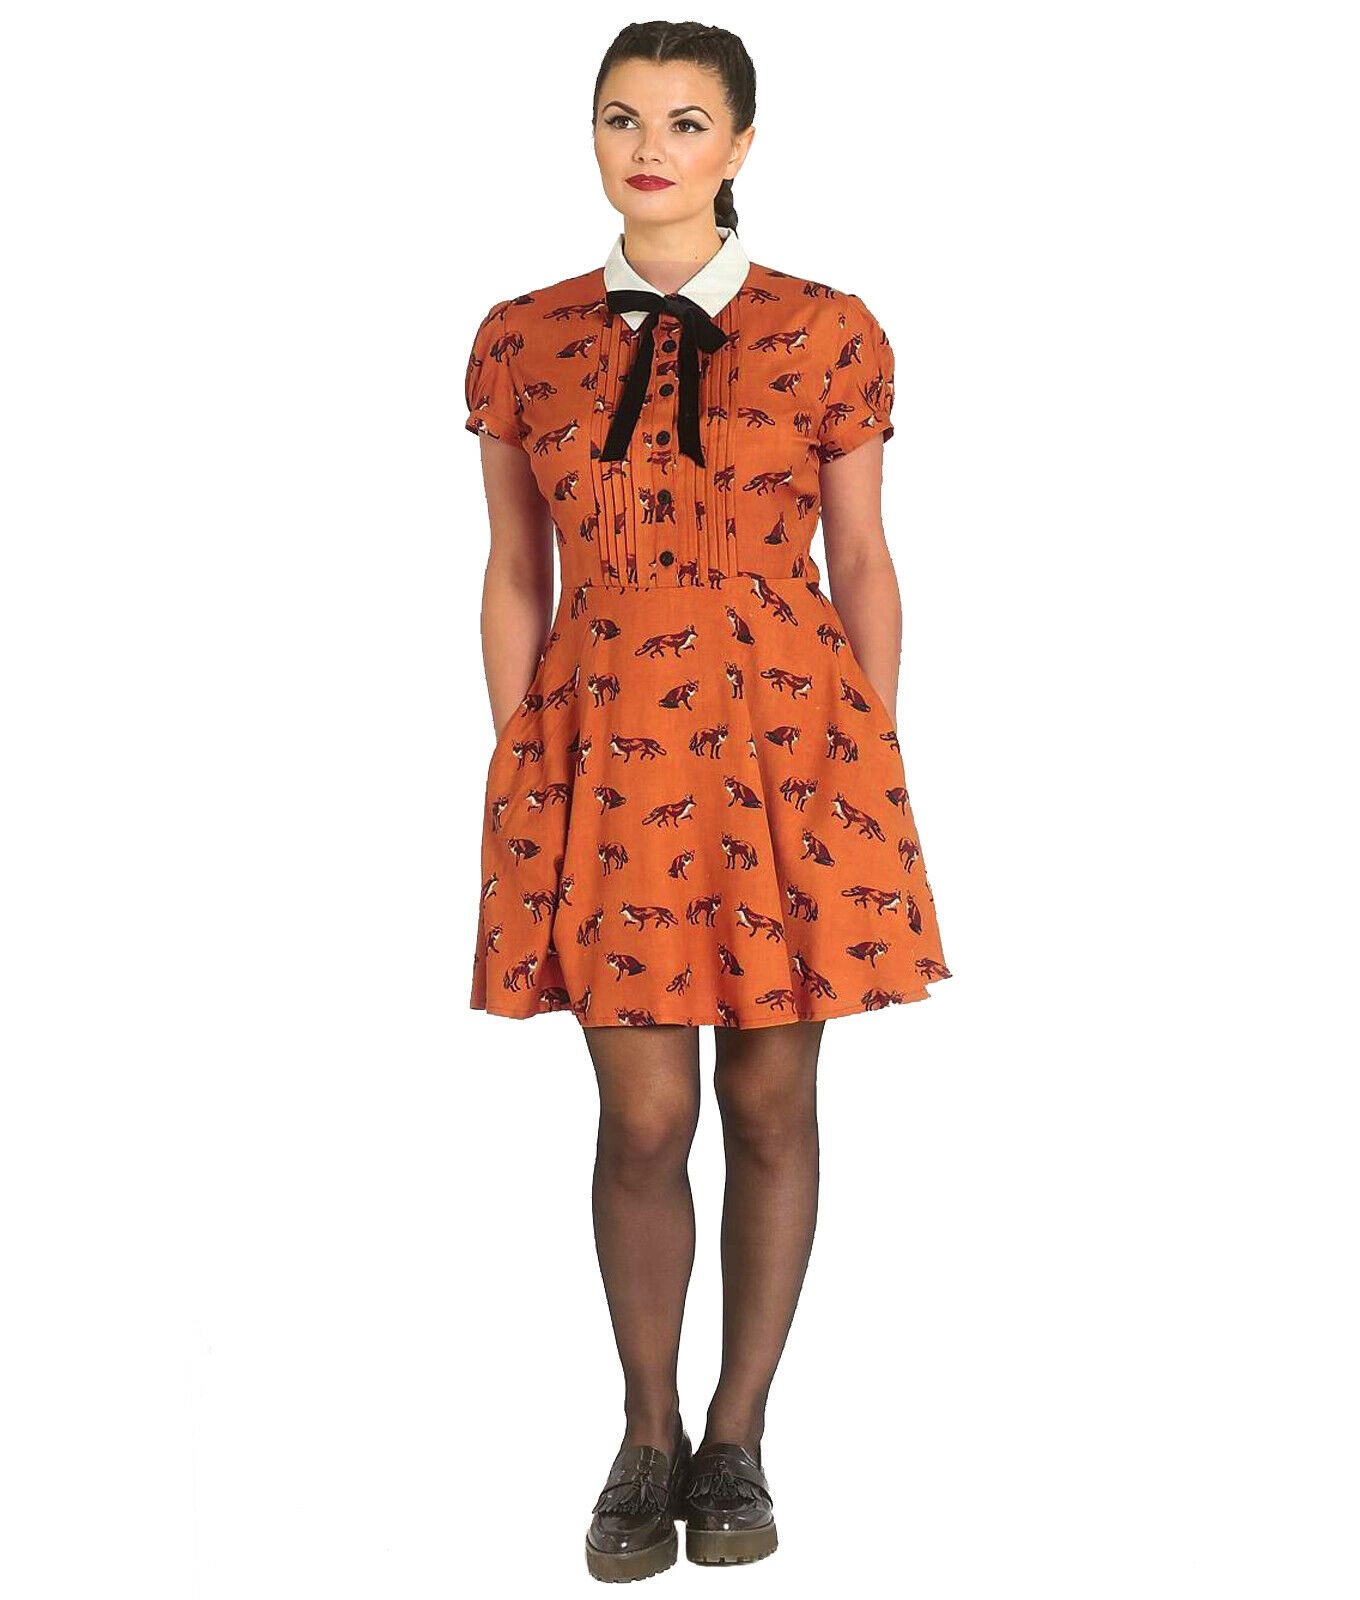 Hell-Bunny-40s-50s-Brown-Mini-Dress-Pin-Up-VIXEY-Vixen-Fox-Print-All-Sizes thumbnail 11